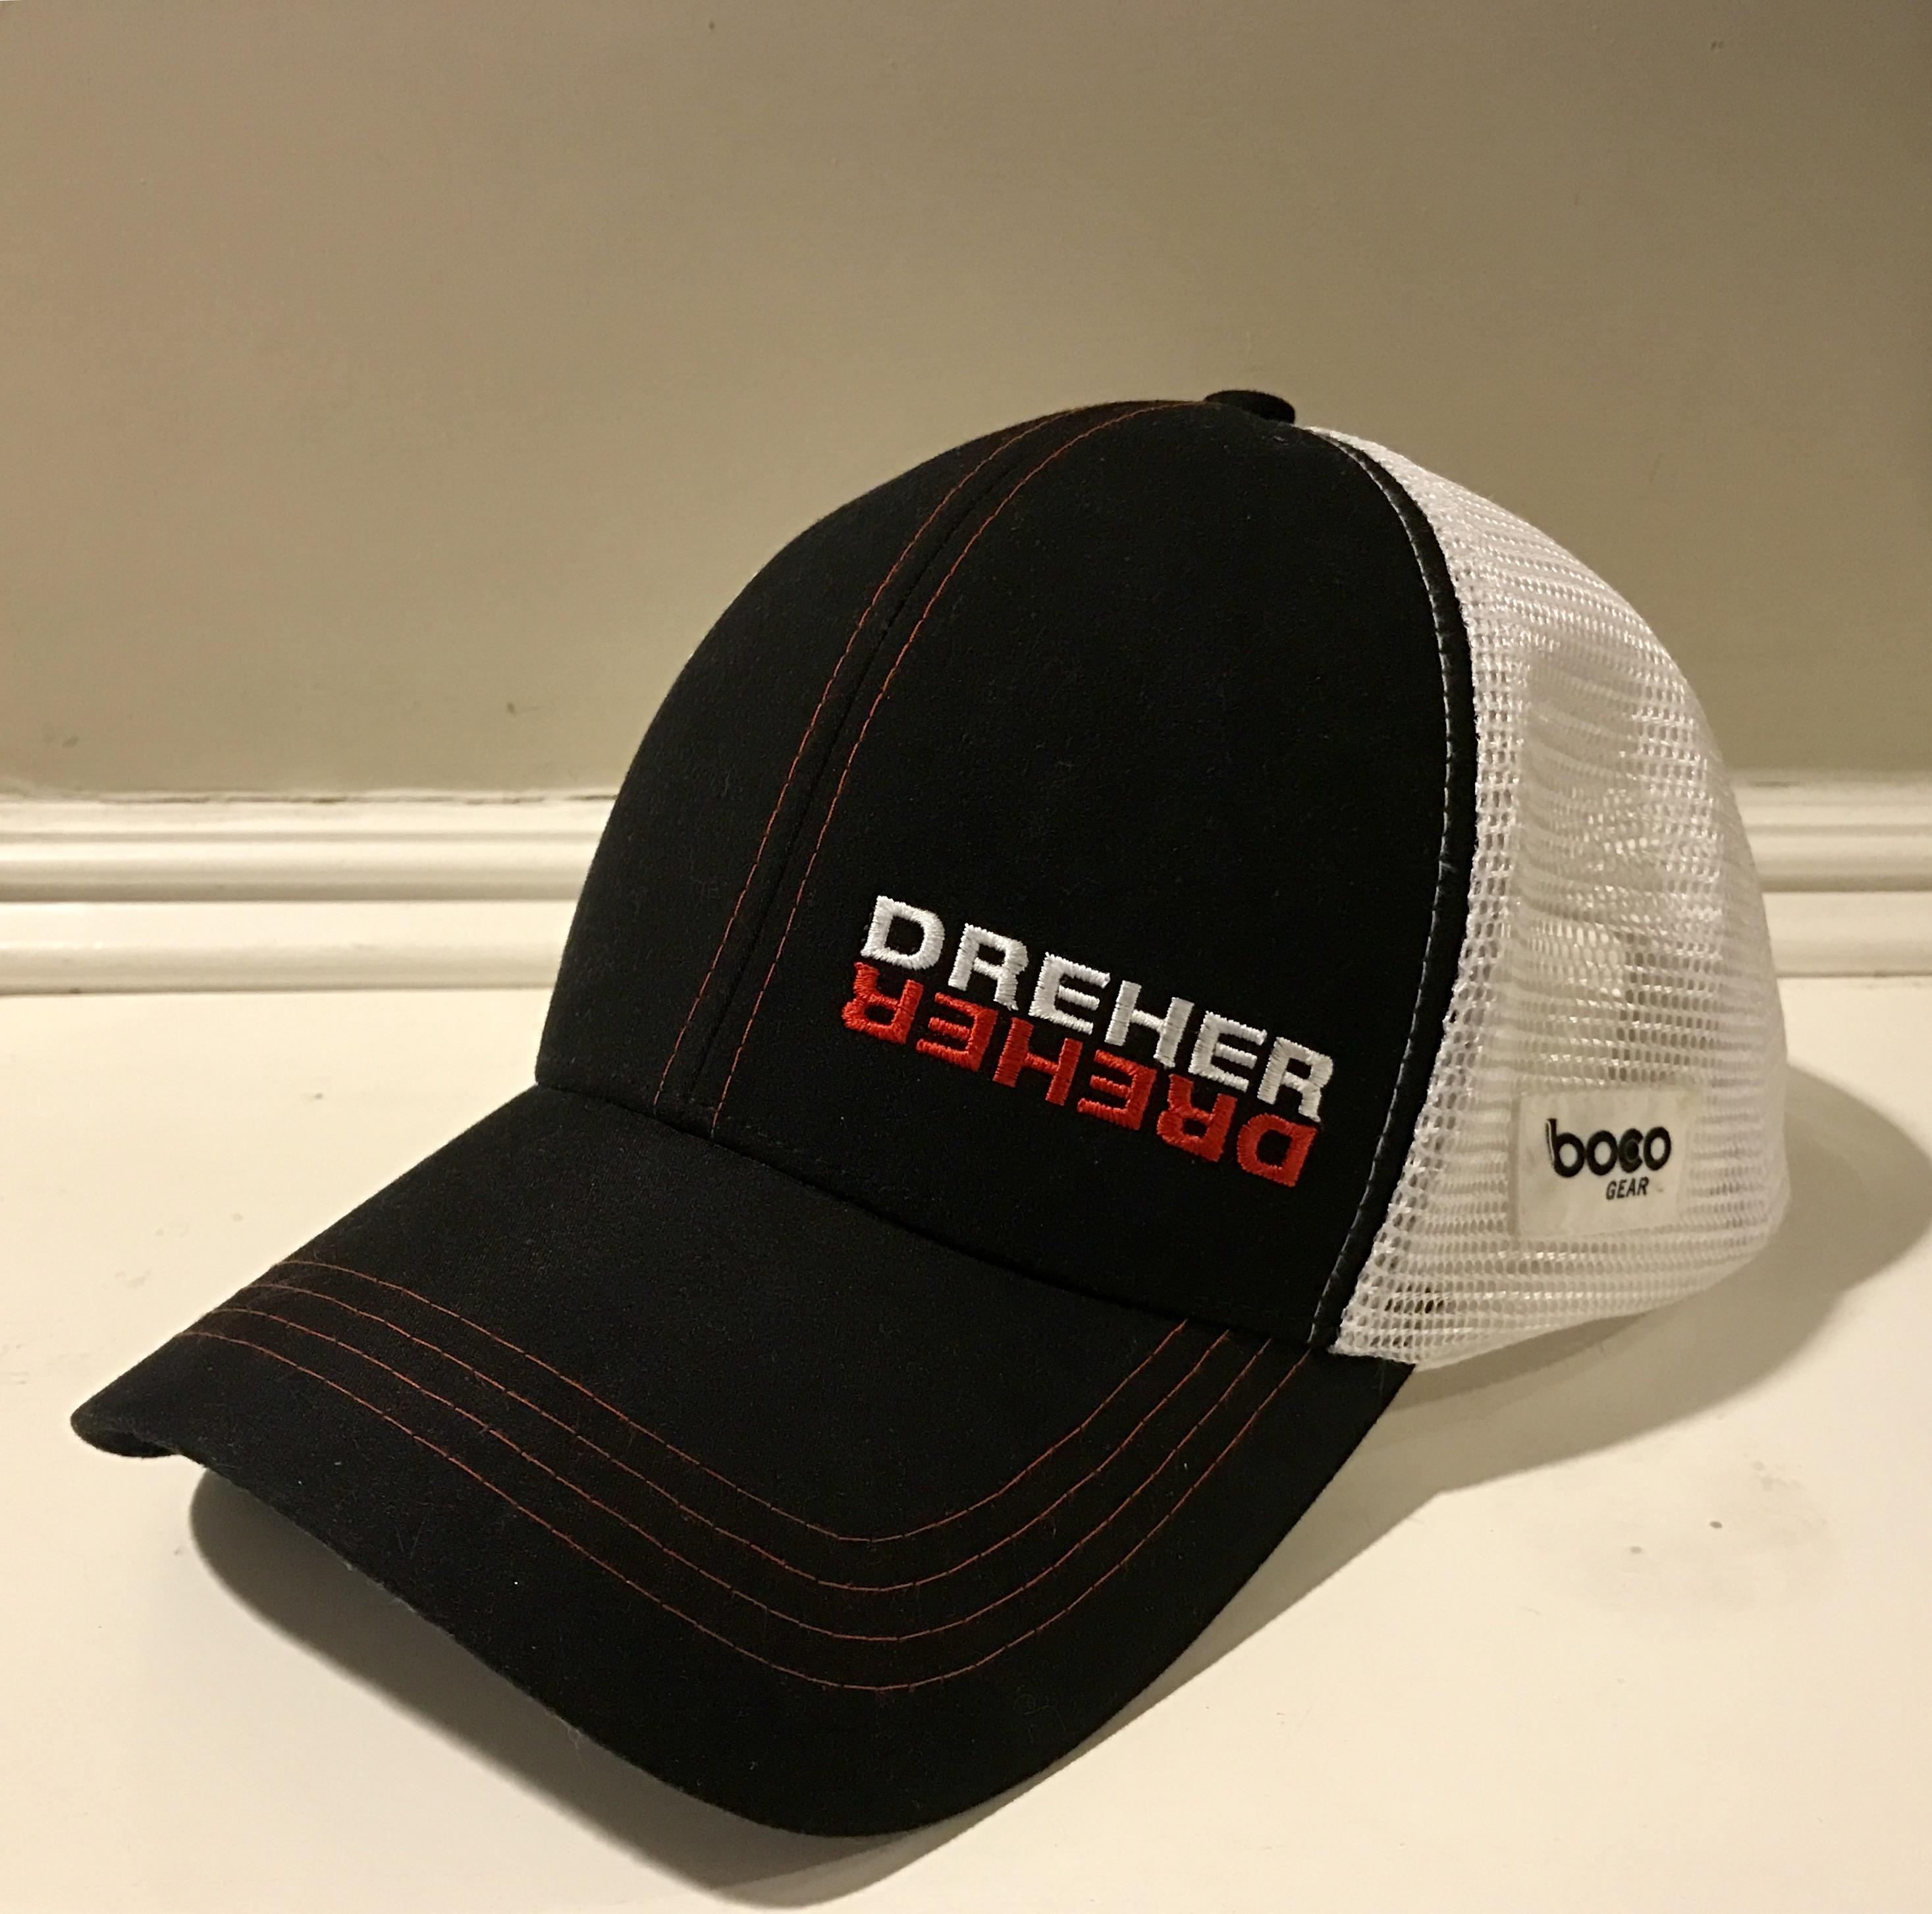 Dreher Hat